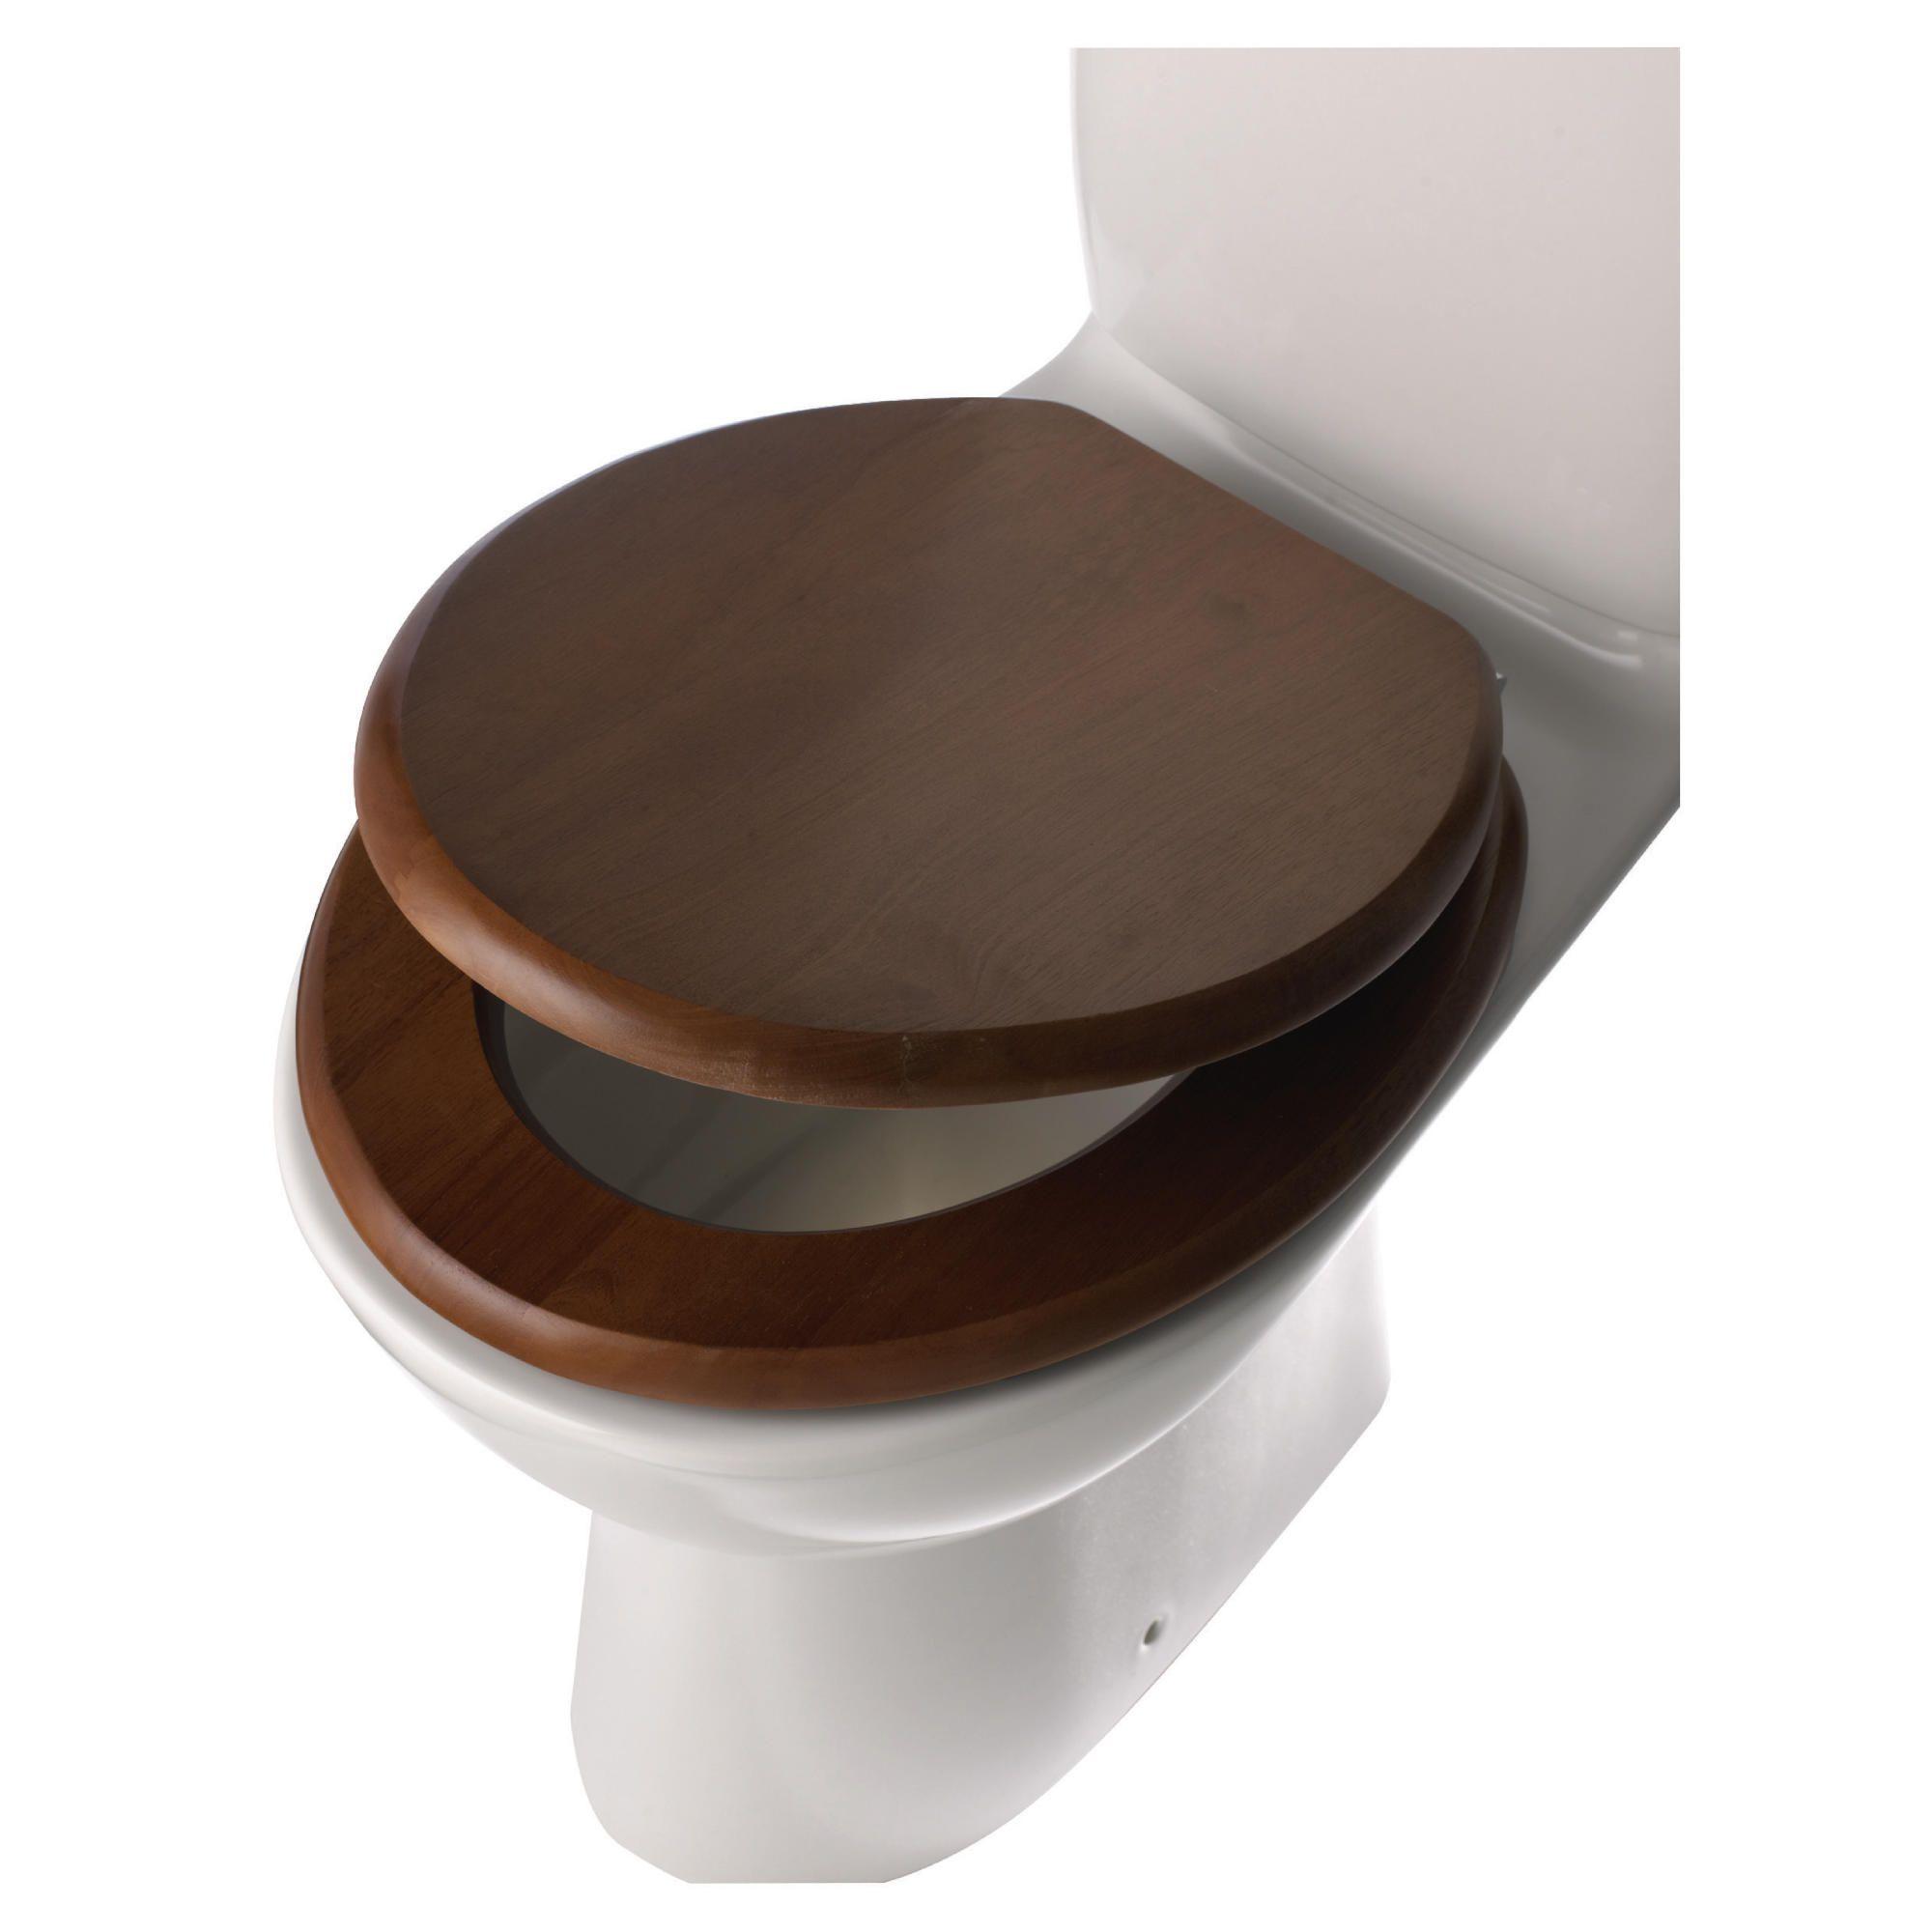 dark brown toilet seat. Comfort Seats C1B1R 17CH Designer Solid Wood Toilet Seat  Black Molded Overstock Shopping